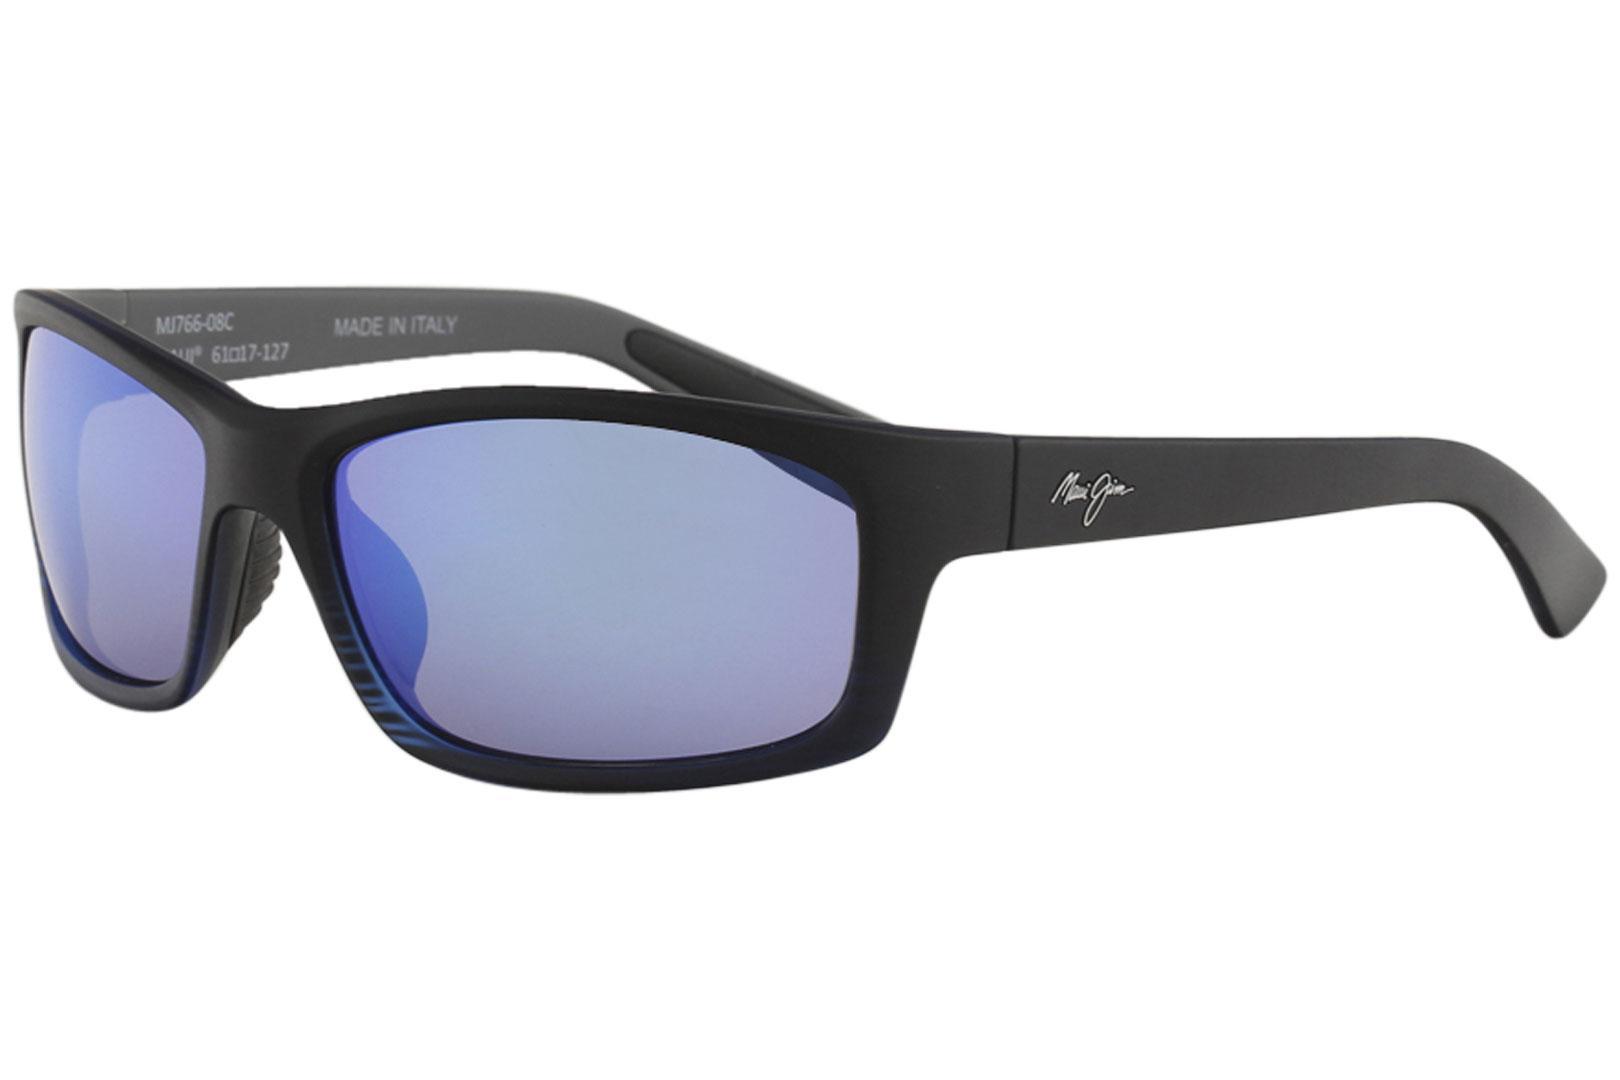 21628da4b6 Maui Jim Men s Kanaio-Coast MJ766 MJ 766 Fashion Rectangle Polarized  Sunglasses